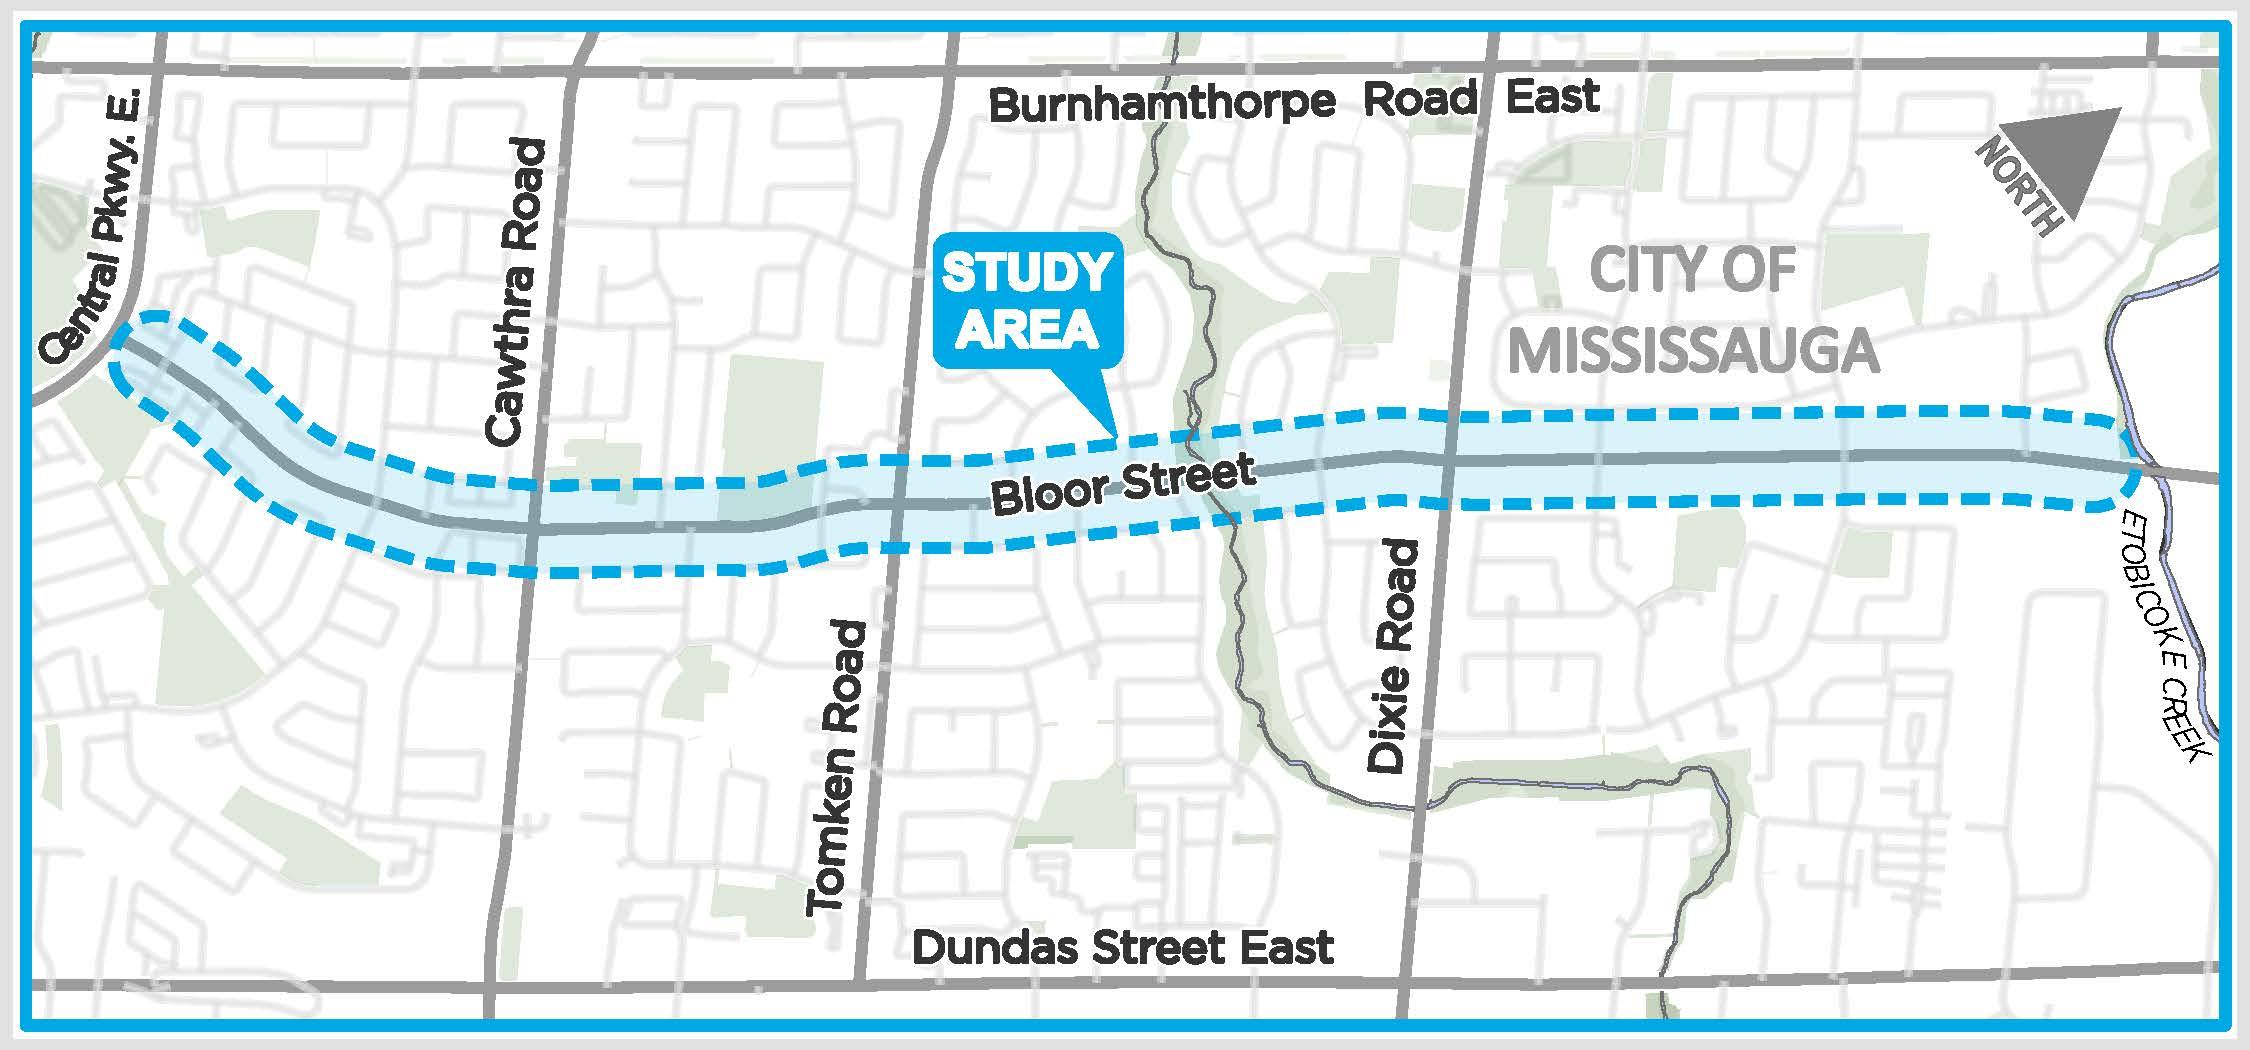 Bloor Street corridor from Central Parkway East to Etobicoke Creek.